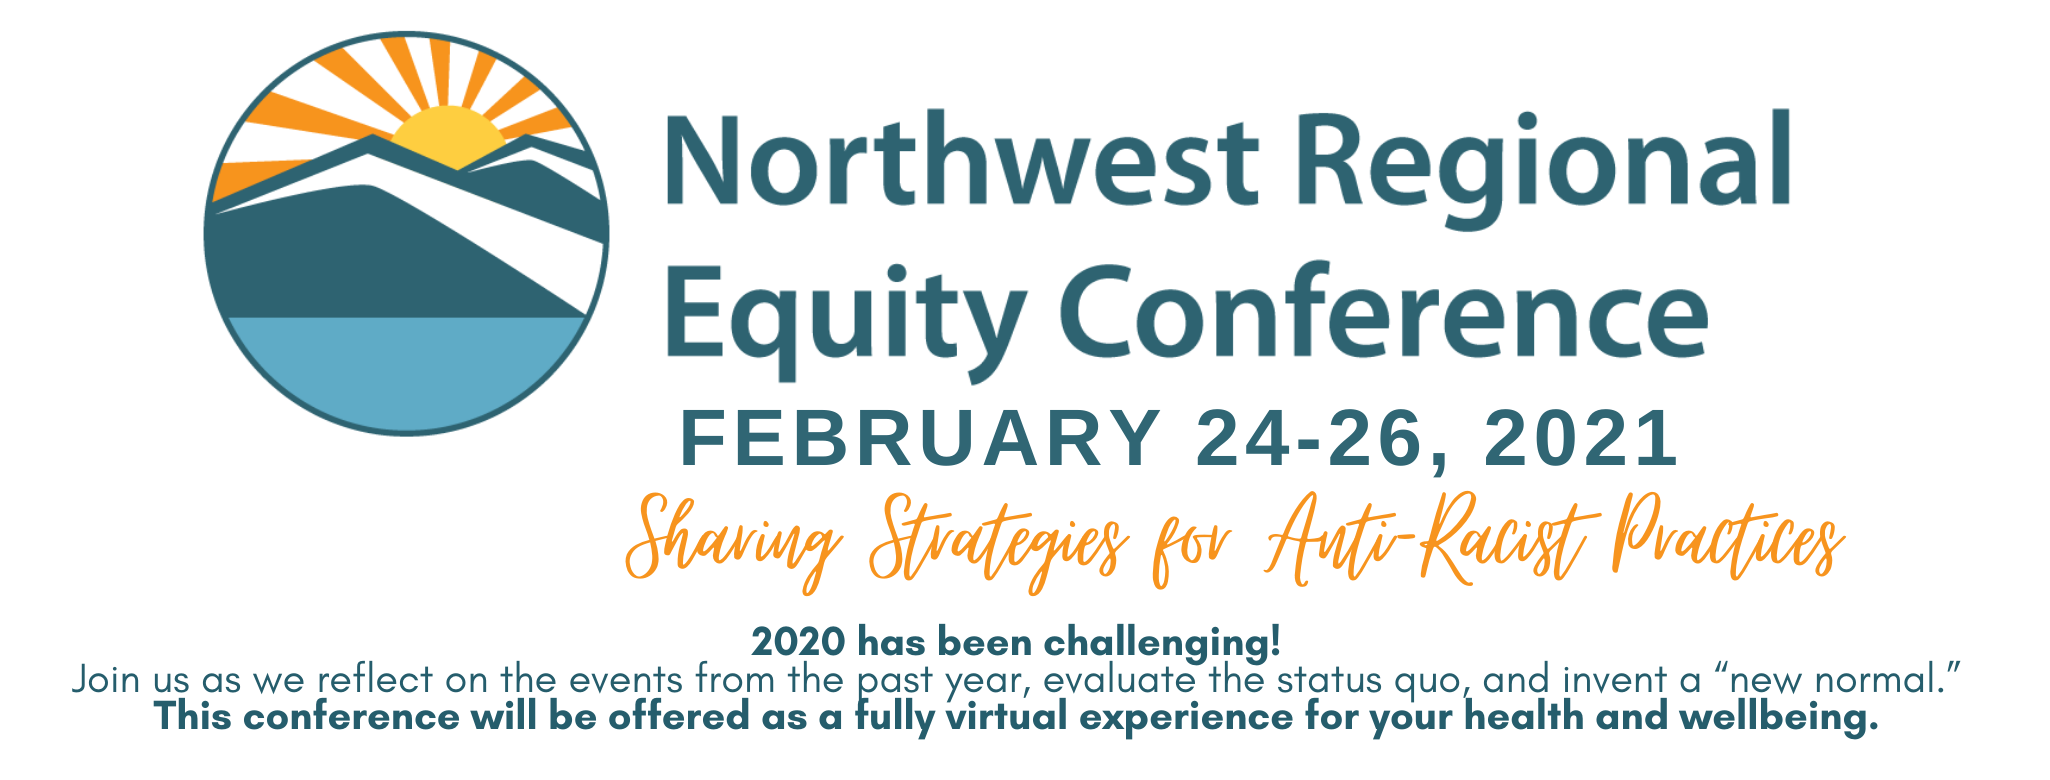 Northwest regional equity conference banner